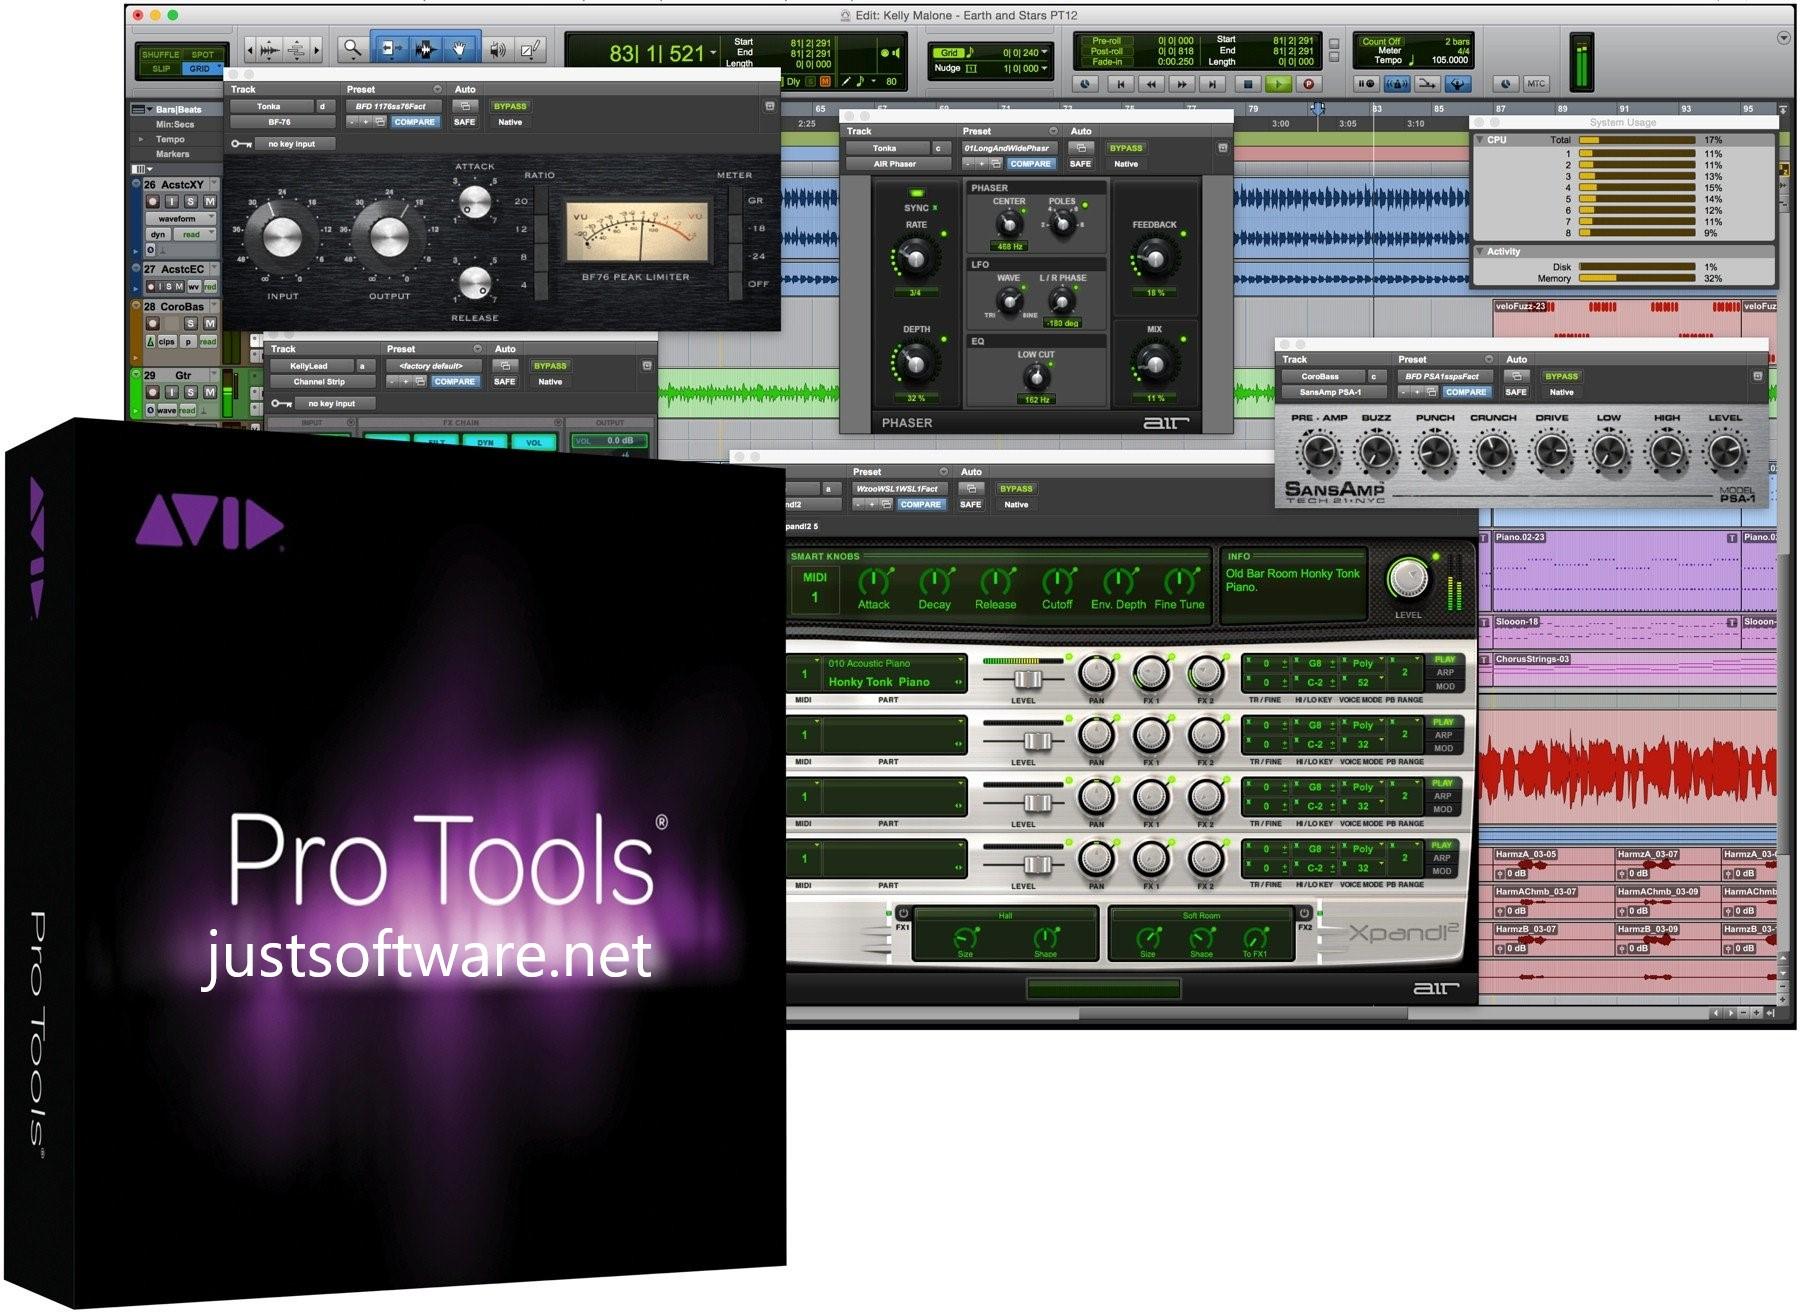 Avid Pro Tools 2020.03 Crack + Torrent Free Download